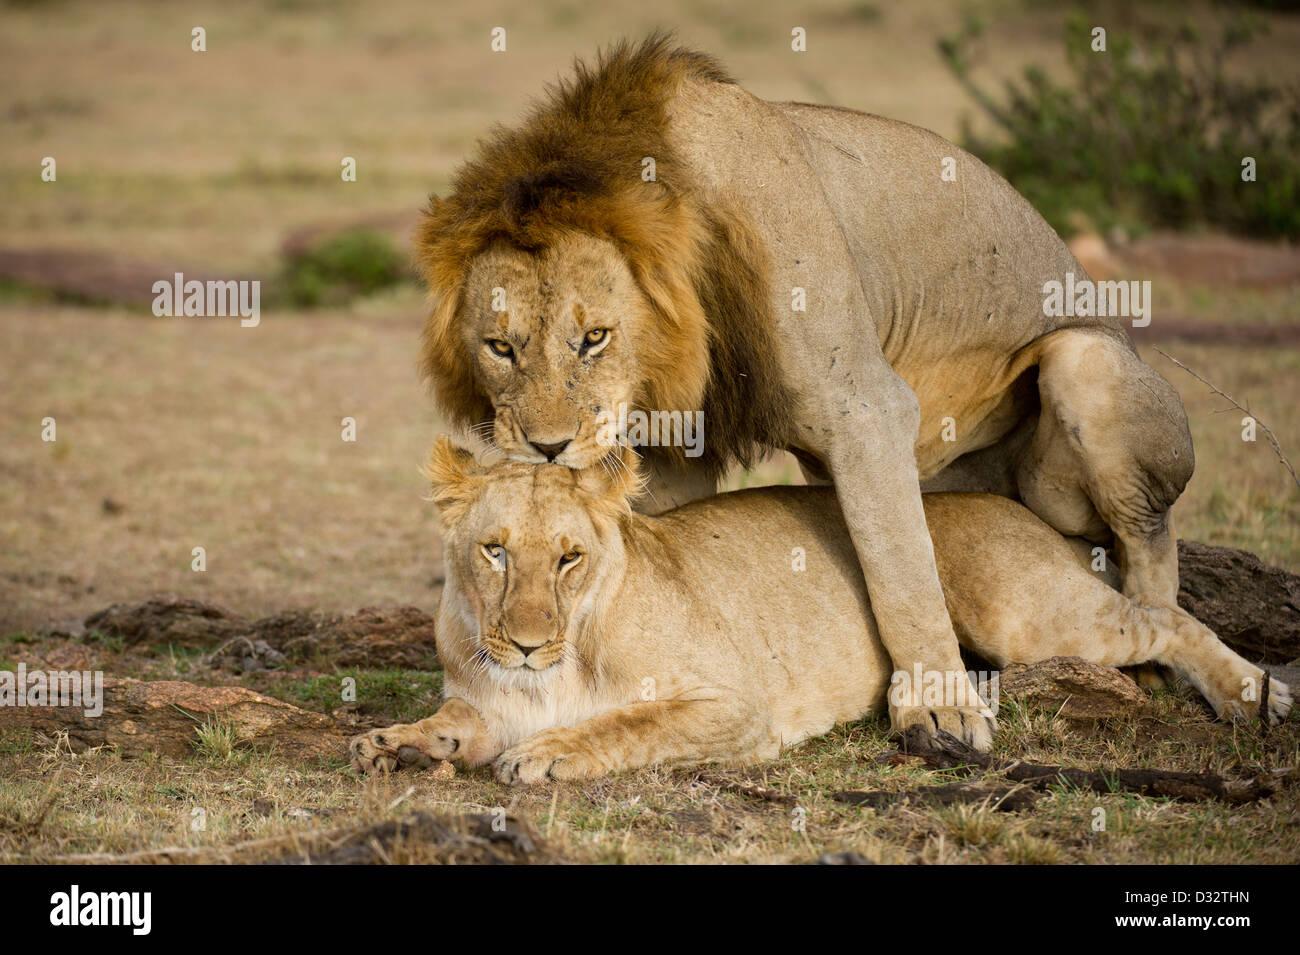 Lions mating (Panthero leo), Maasai Mara National Reserve, Kenya - Stock Image